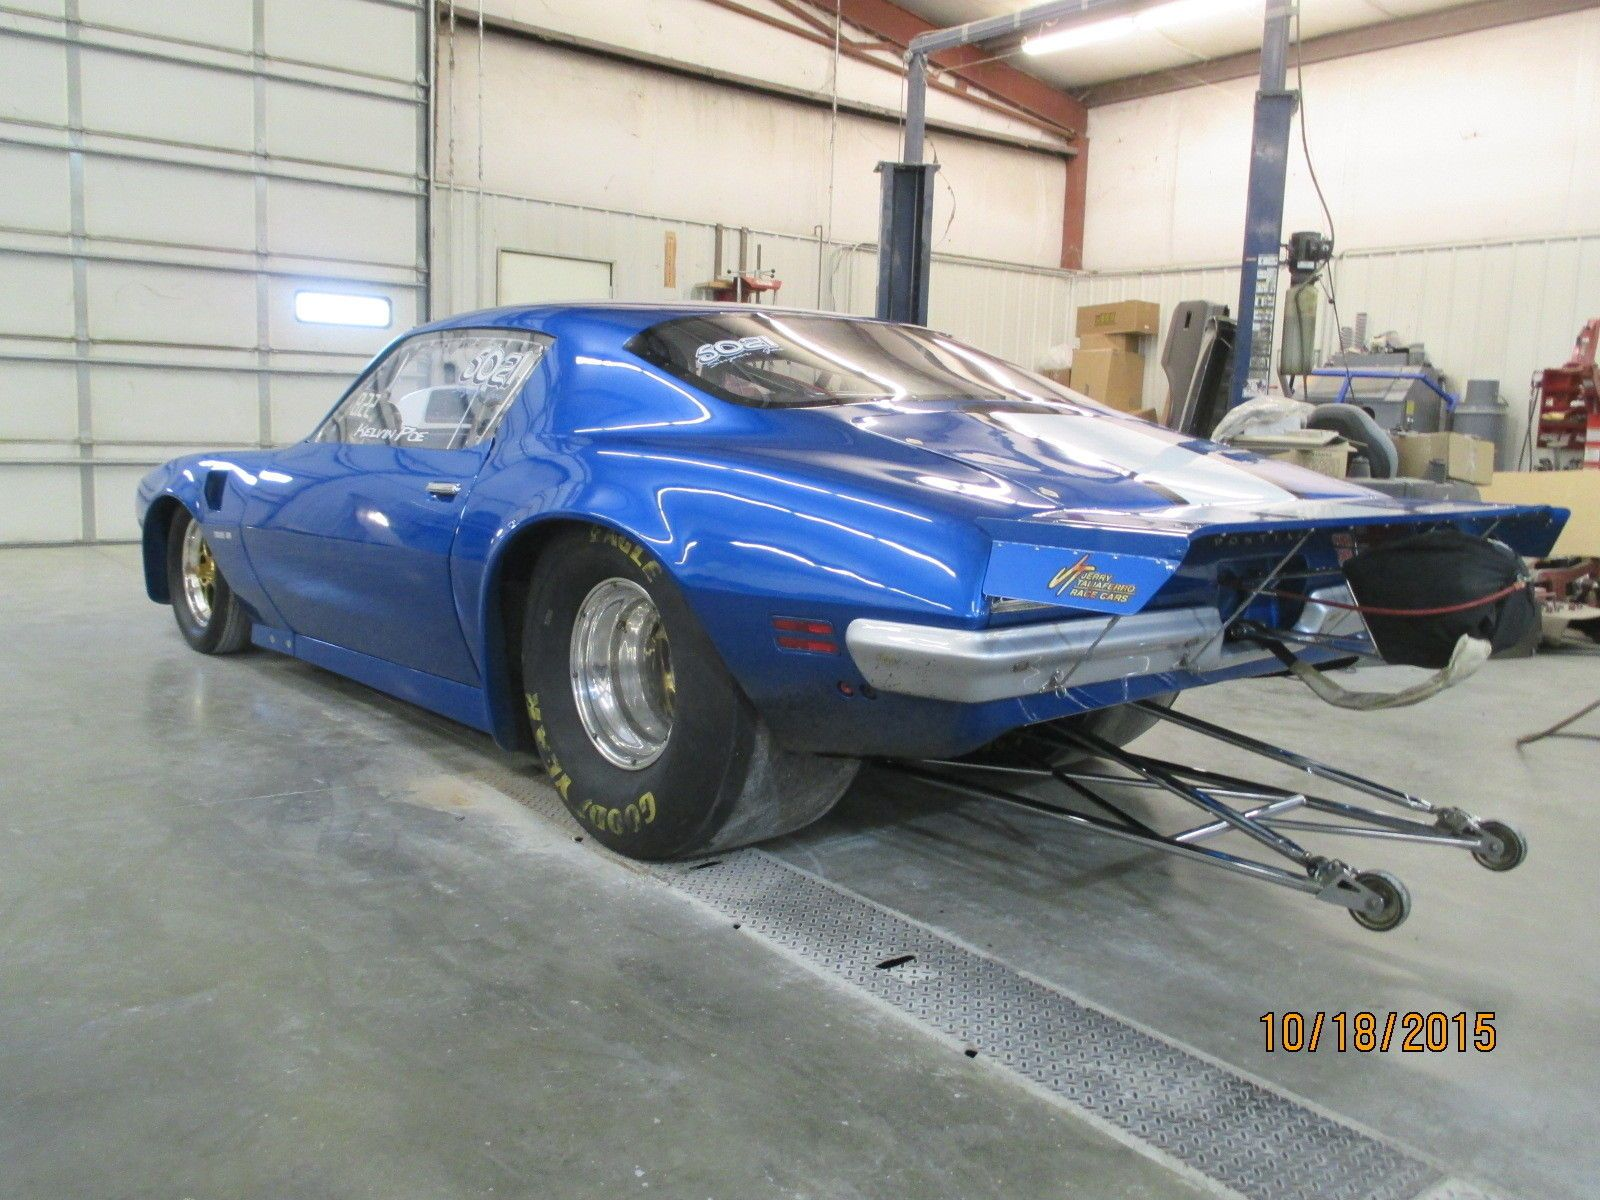 1970 Pontiac Trans Am Tube Chassis Drag Car 4 | Go Pro Street or ...